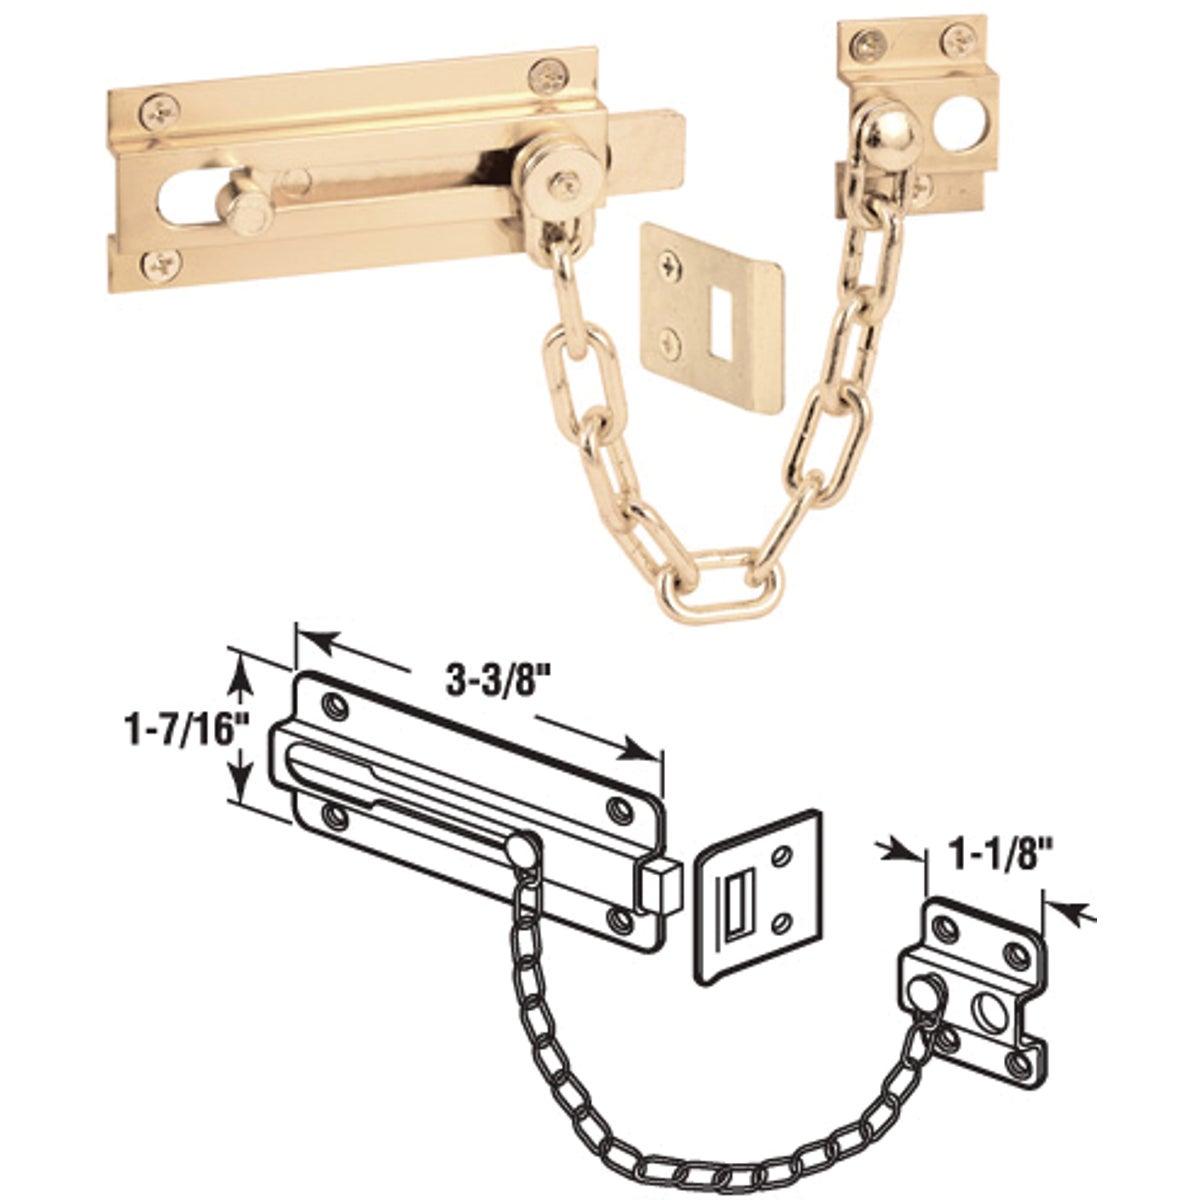 PB GUARD DOOR BOLT - U 9911 by Prime Line Products